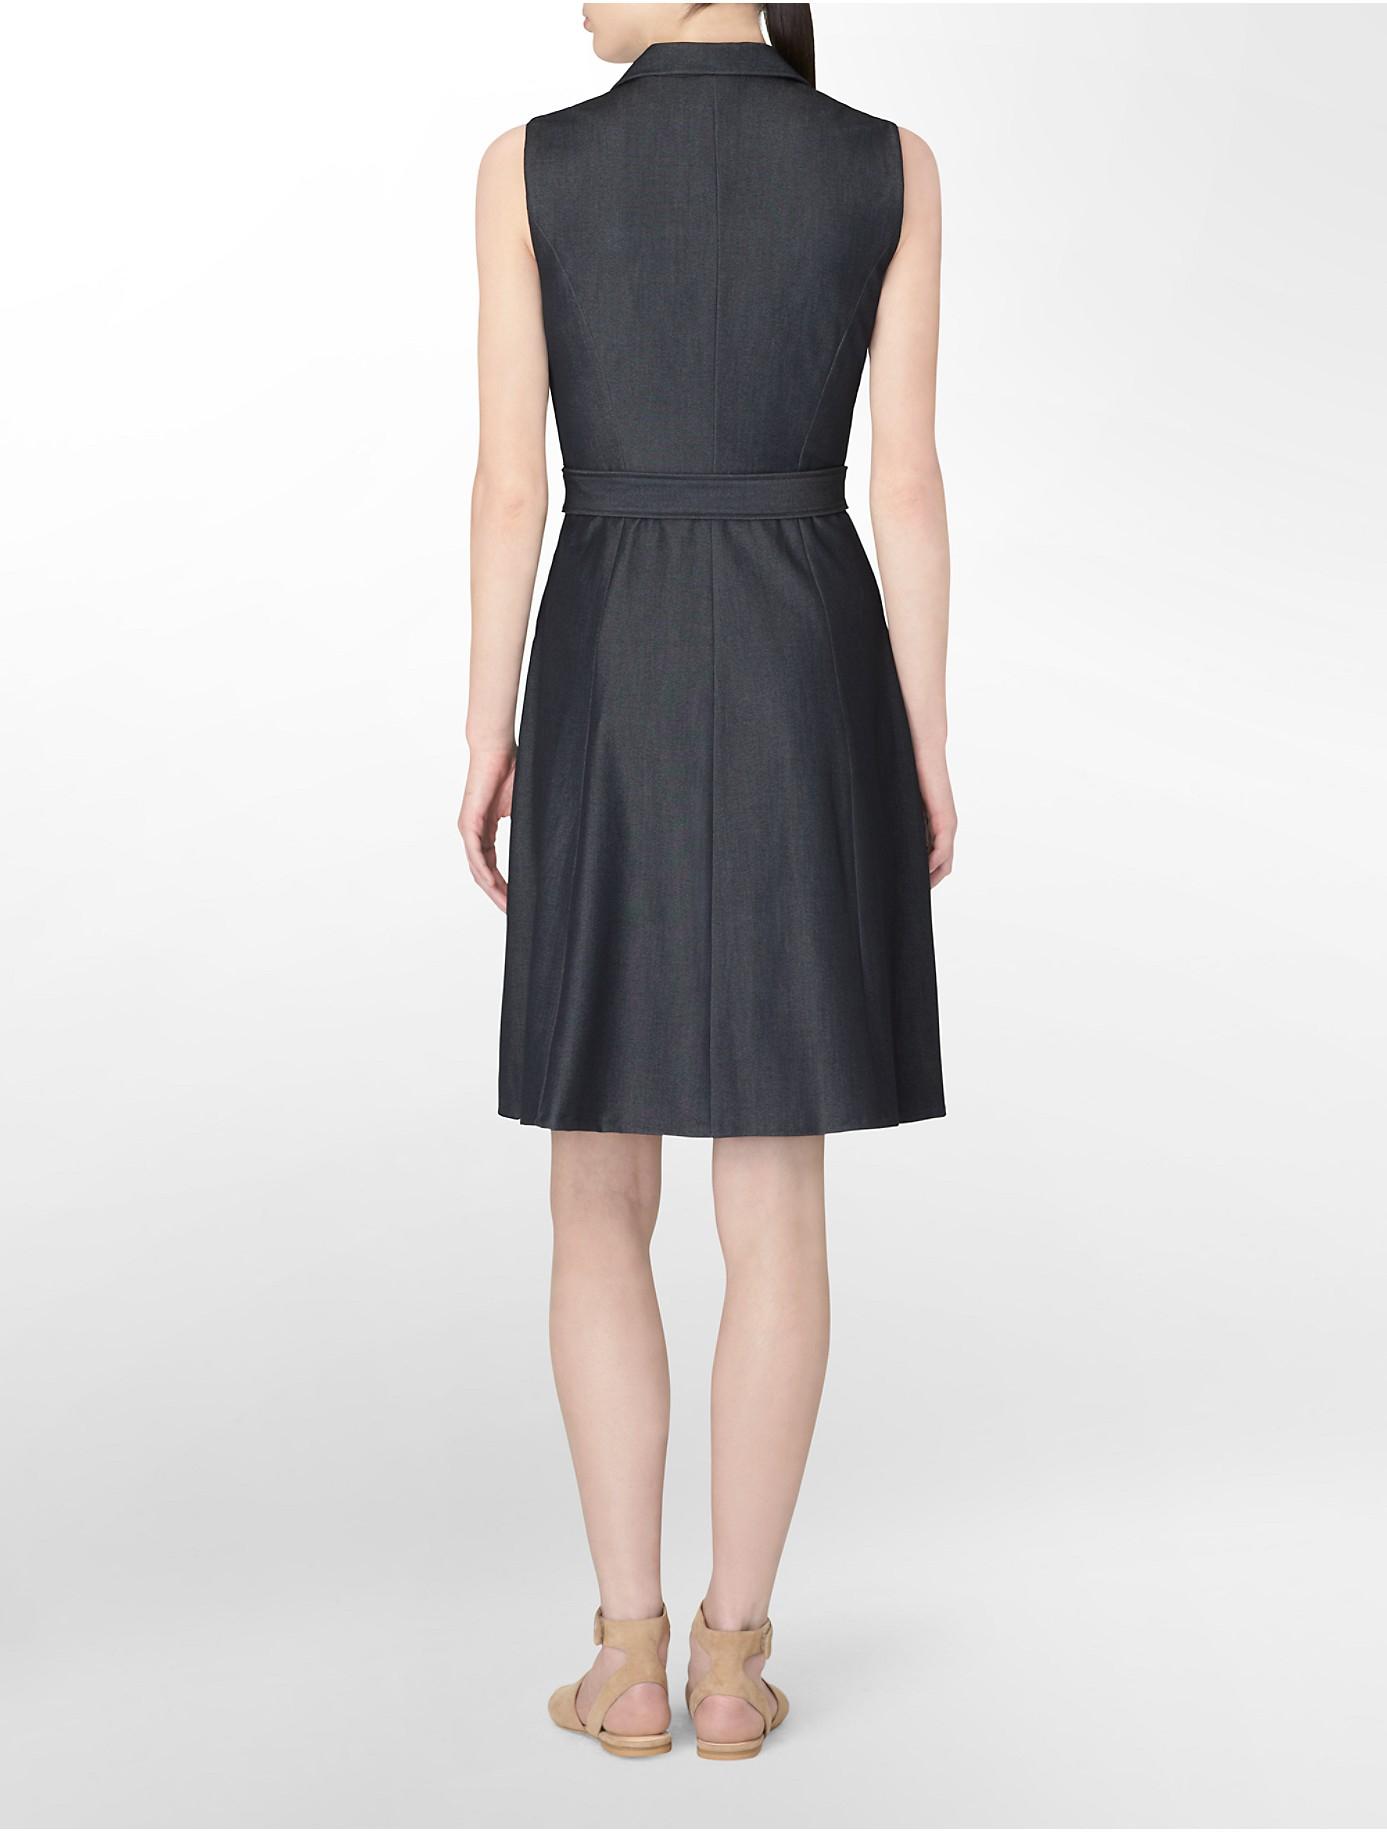 Calvin Klein White Label Sleeveless Wrap Style Belted